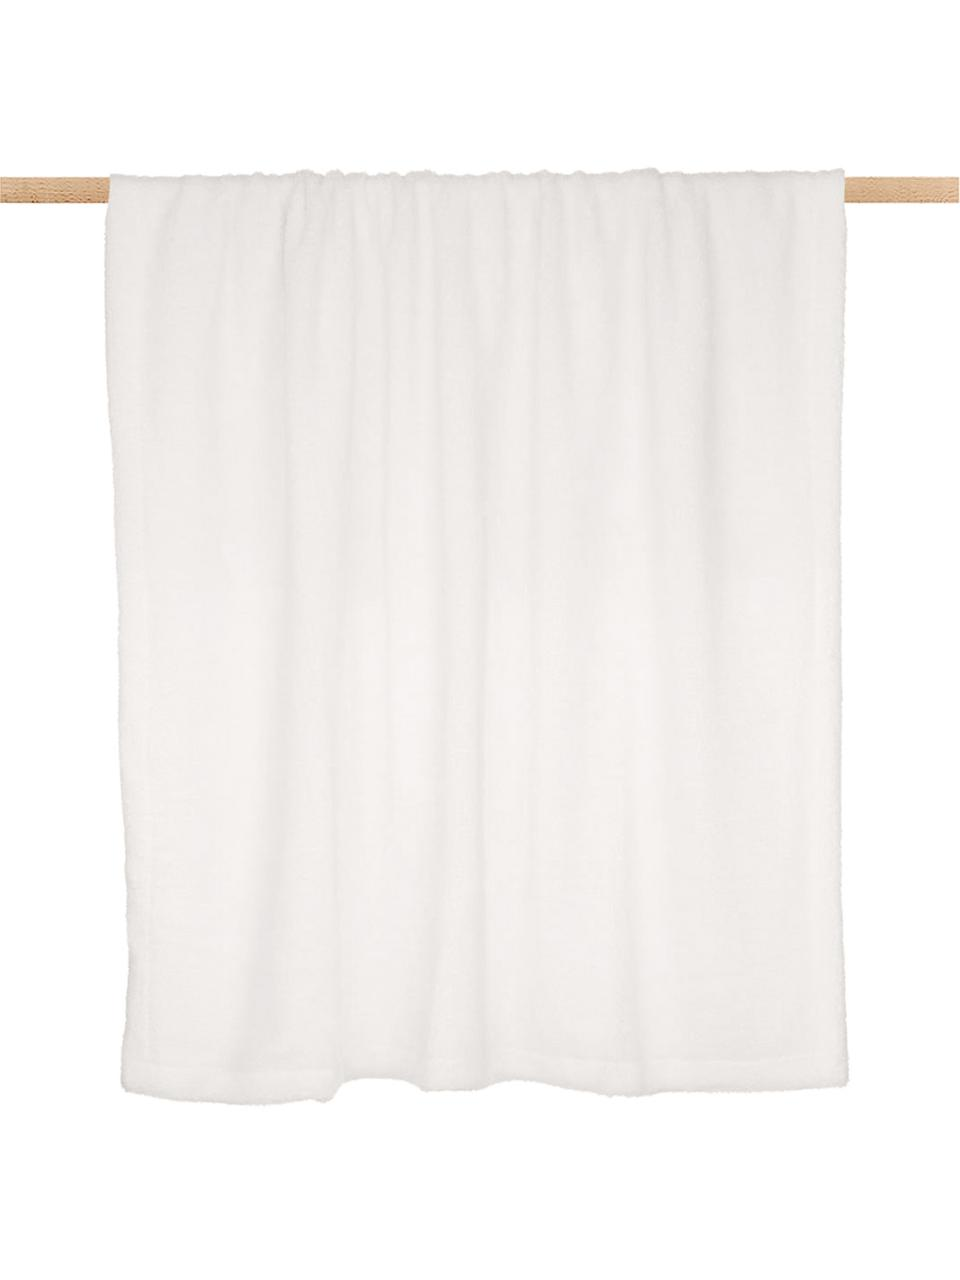 Plaid in teddy color crema Mille, Retro: 100% poliestere, Crema, Larg. 150 x Lung. 200 cm